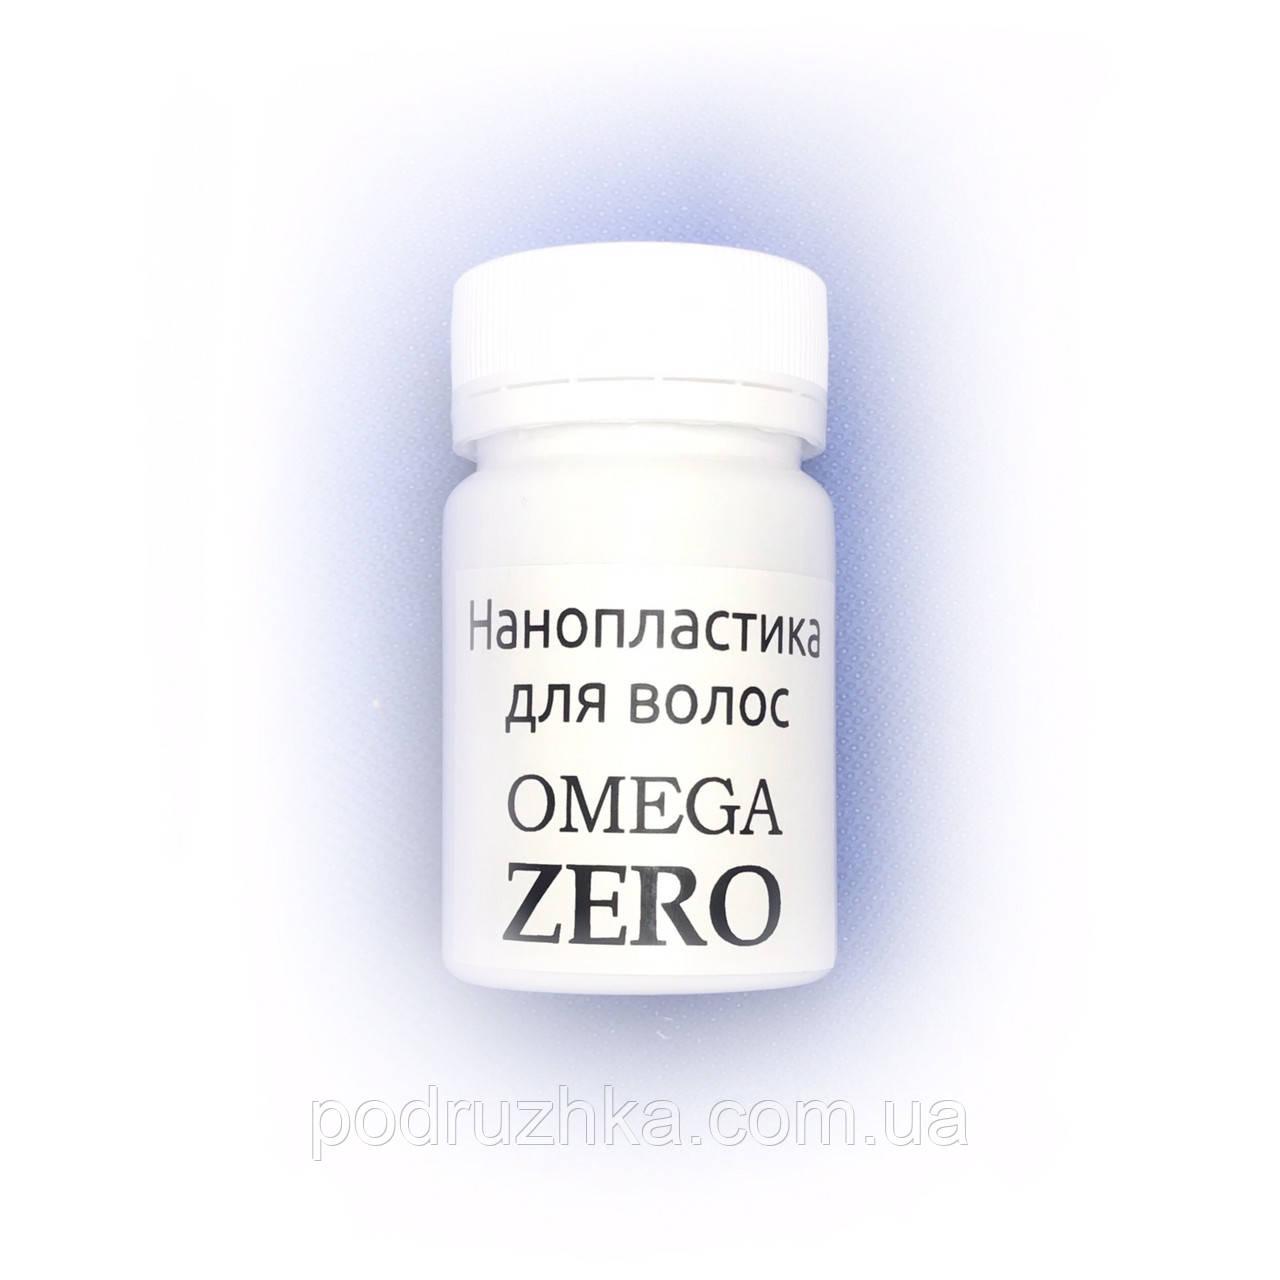 Нанопластика для волос Omega Zero Black Nanoplastia 100 г